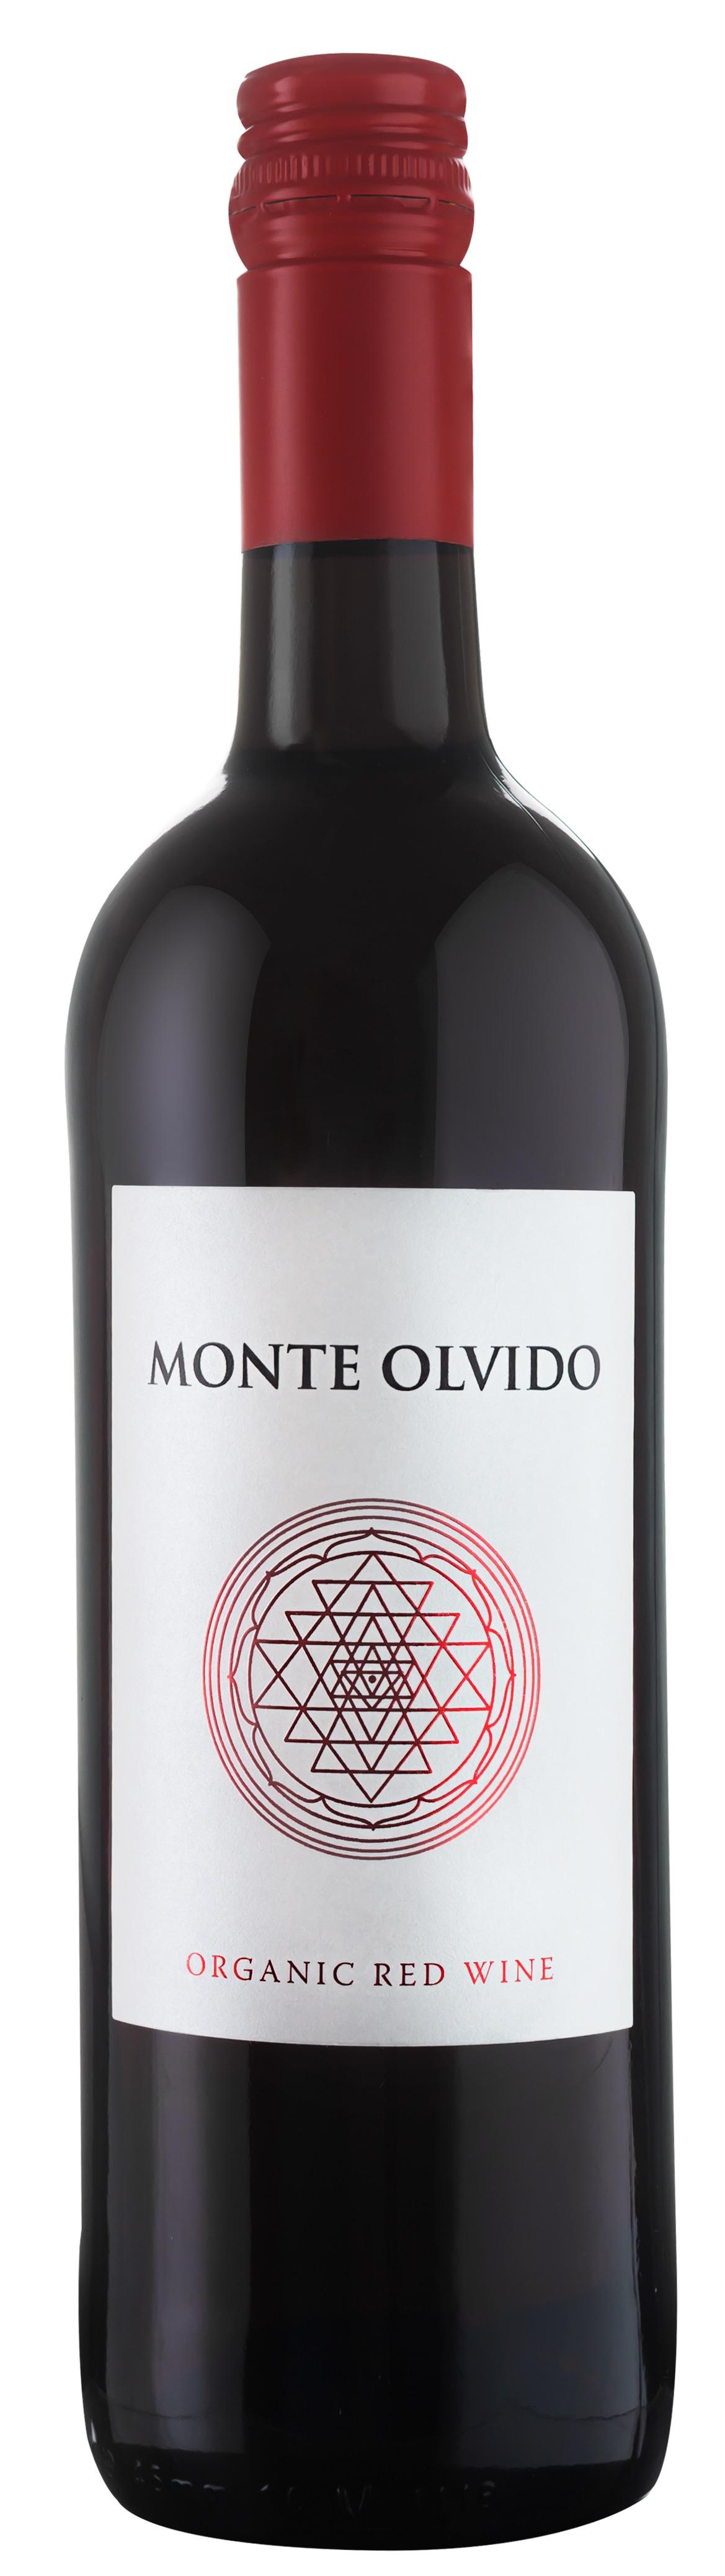 Monte Olvido   Winexfood - Winexfood